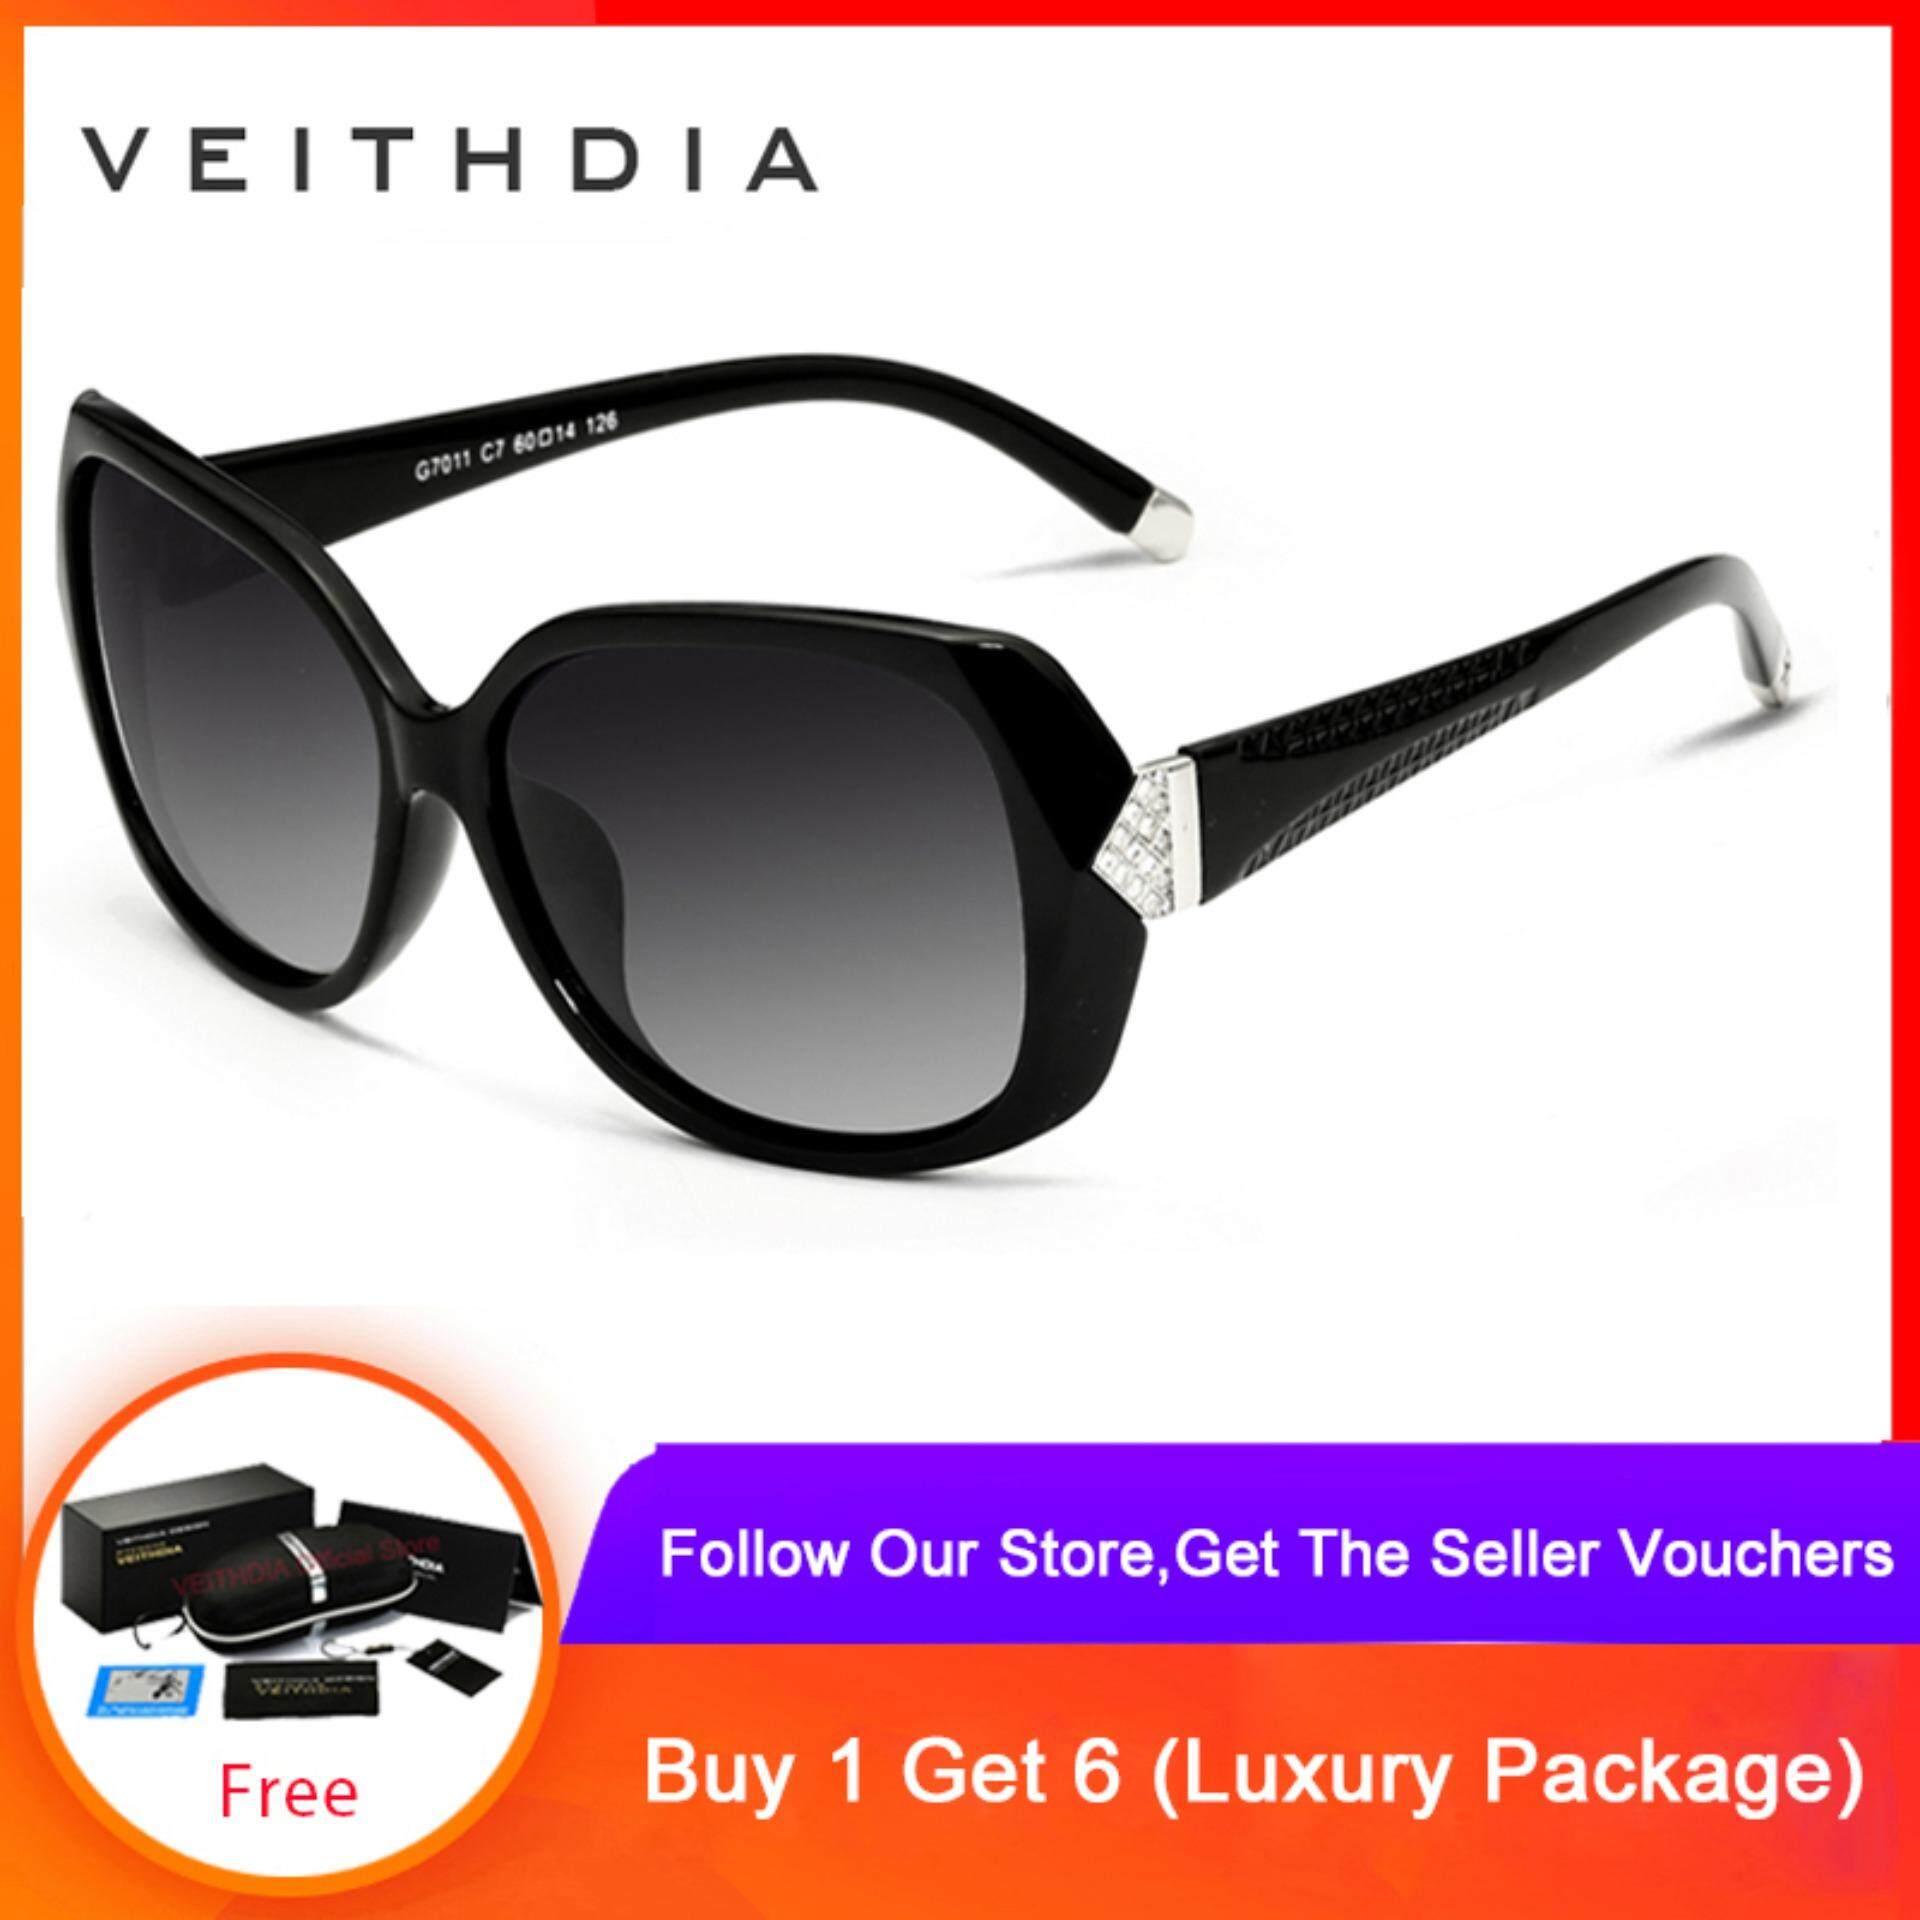 2019 Classic Polarized Sunglasses Men Women Driving Square Frame Sun Glasses Eliminate Harsh Glare Shades Oculo Uv400 Men's Glasses